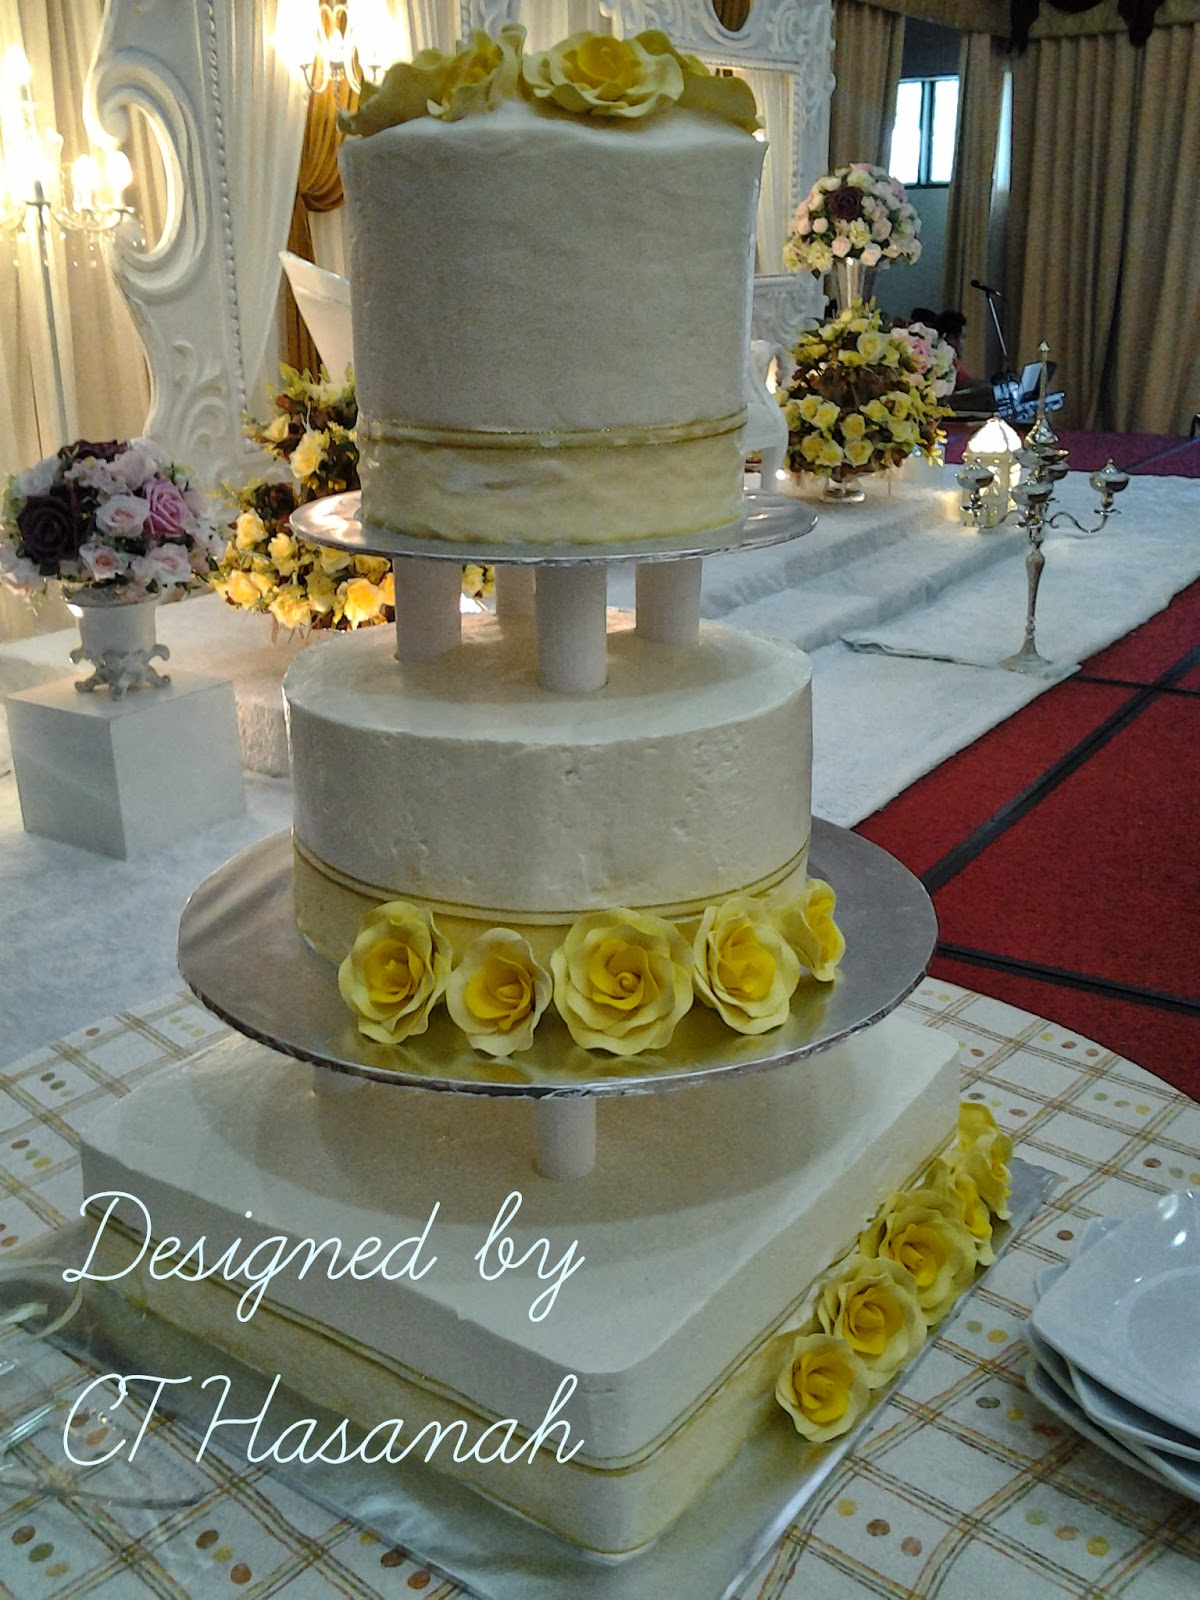 CT Hasanah Cake House 3 Tier Wedding Cake